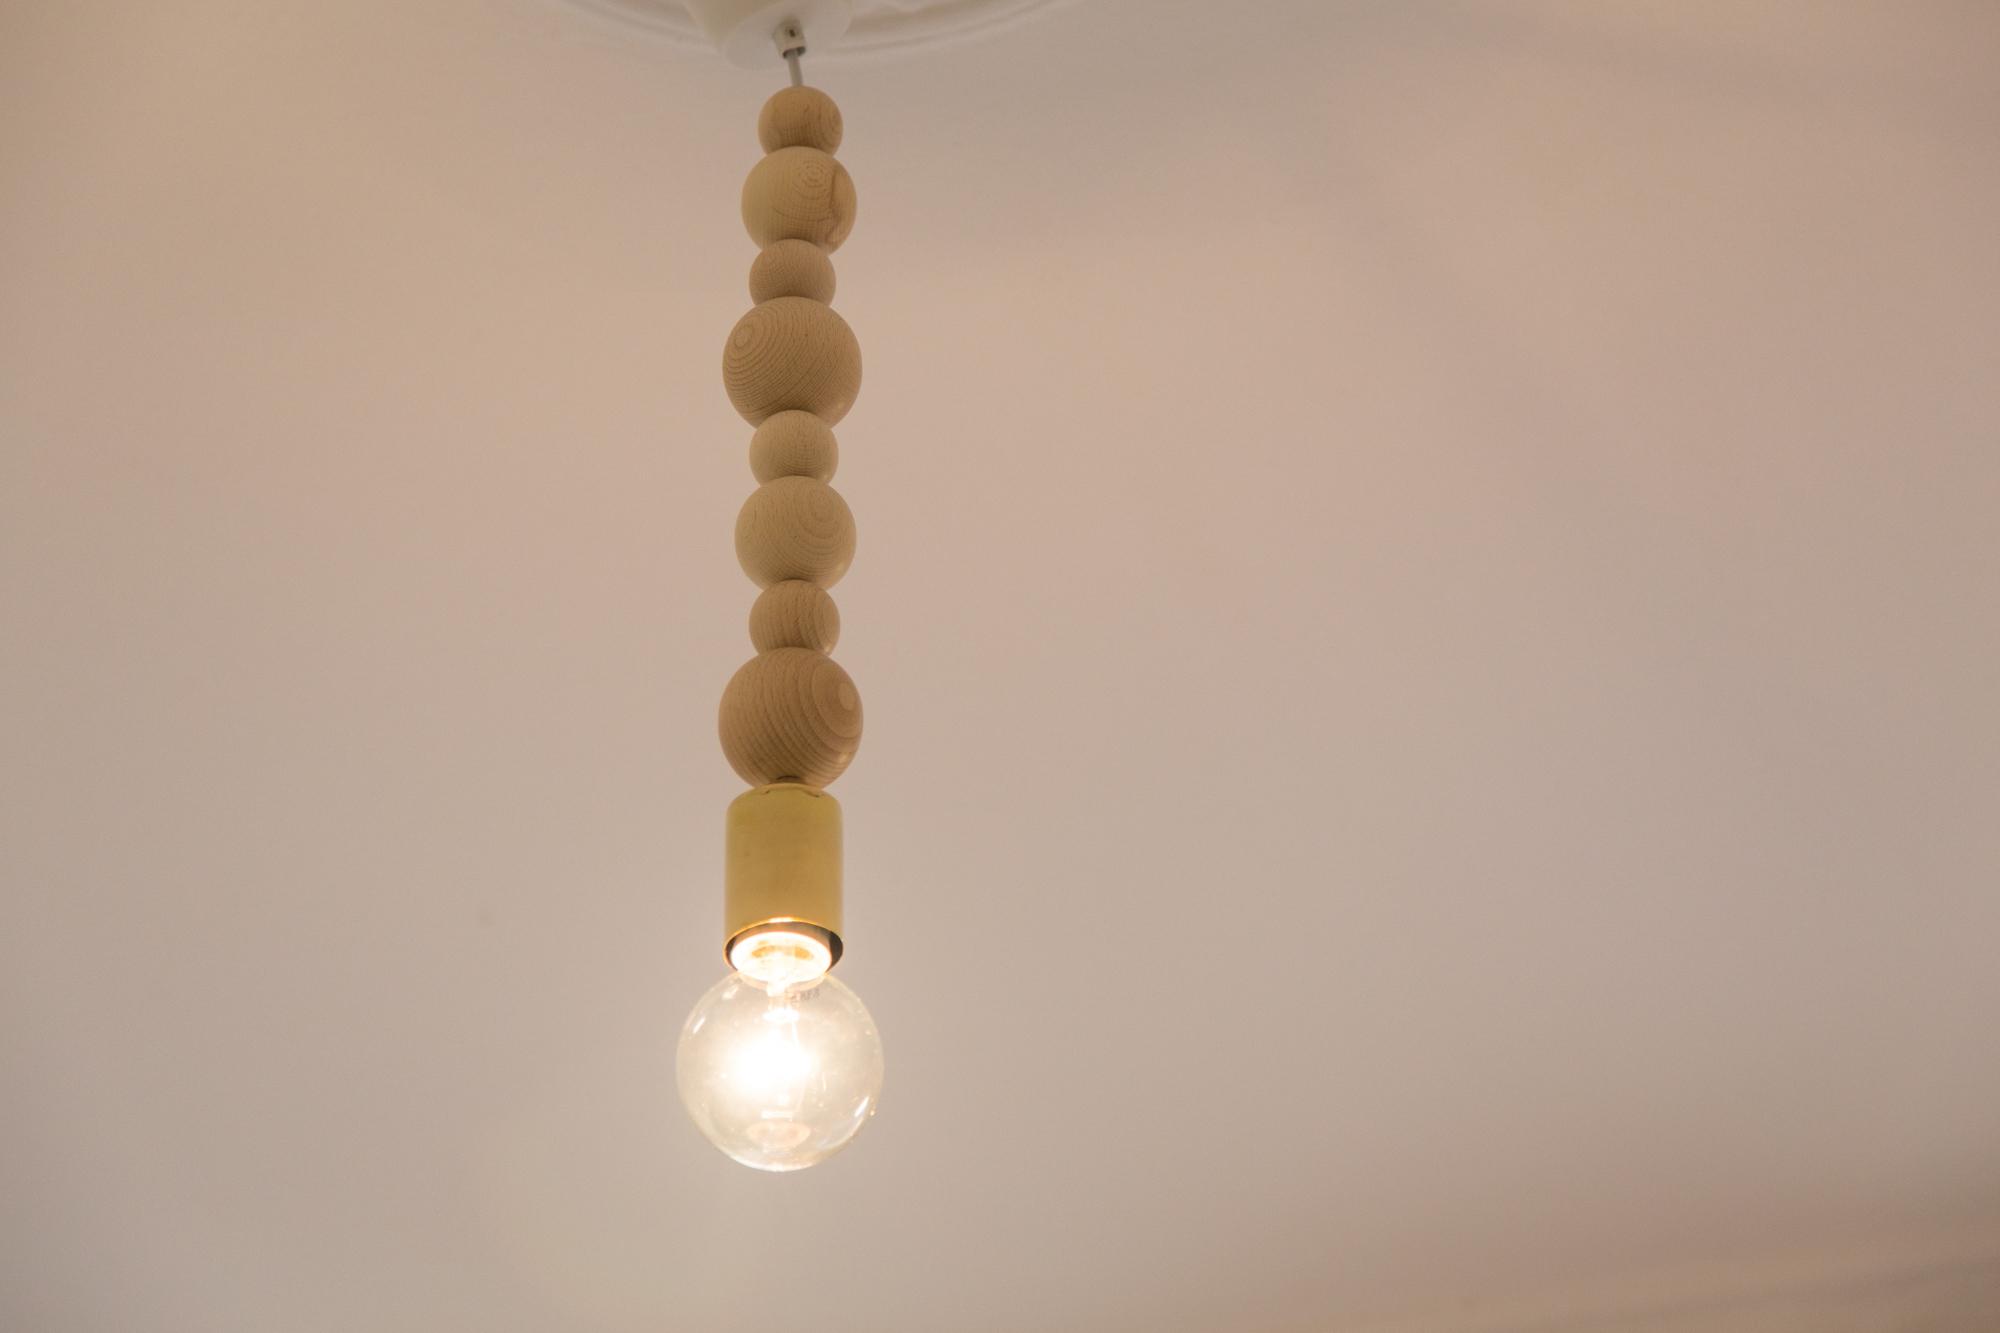 DIY Wooden Bead Lamp